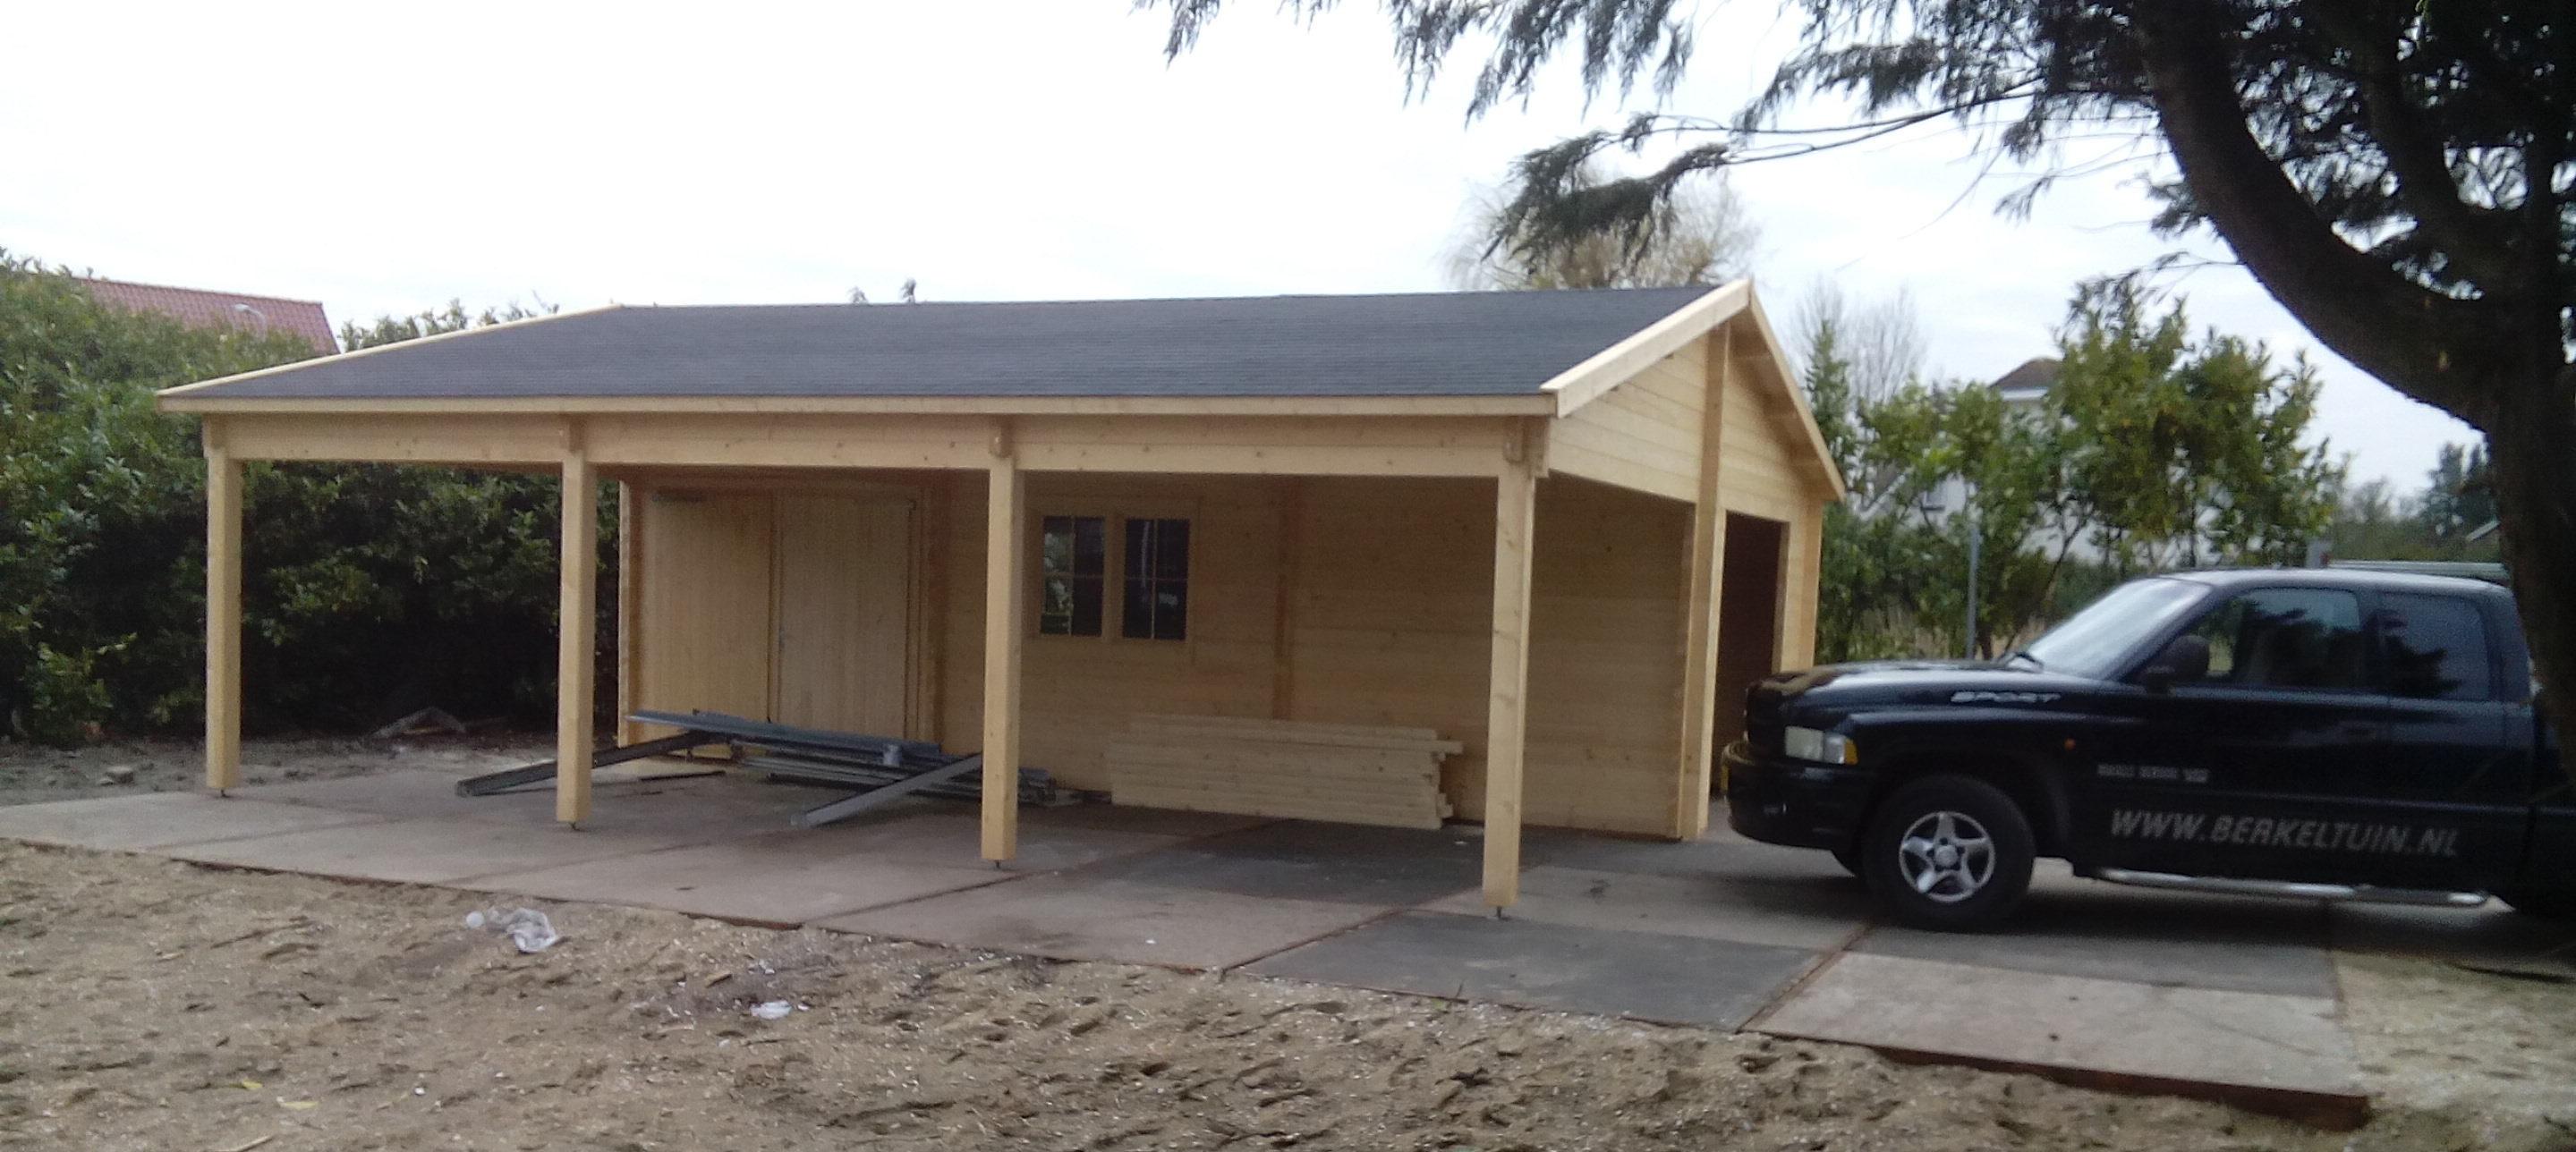 Blokhut met garage en veranda tegelcentrum for Garage con veranda